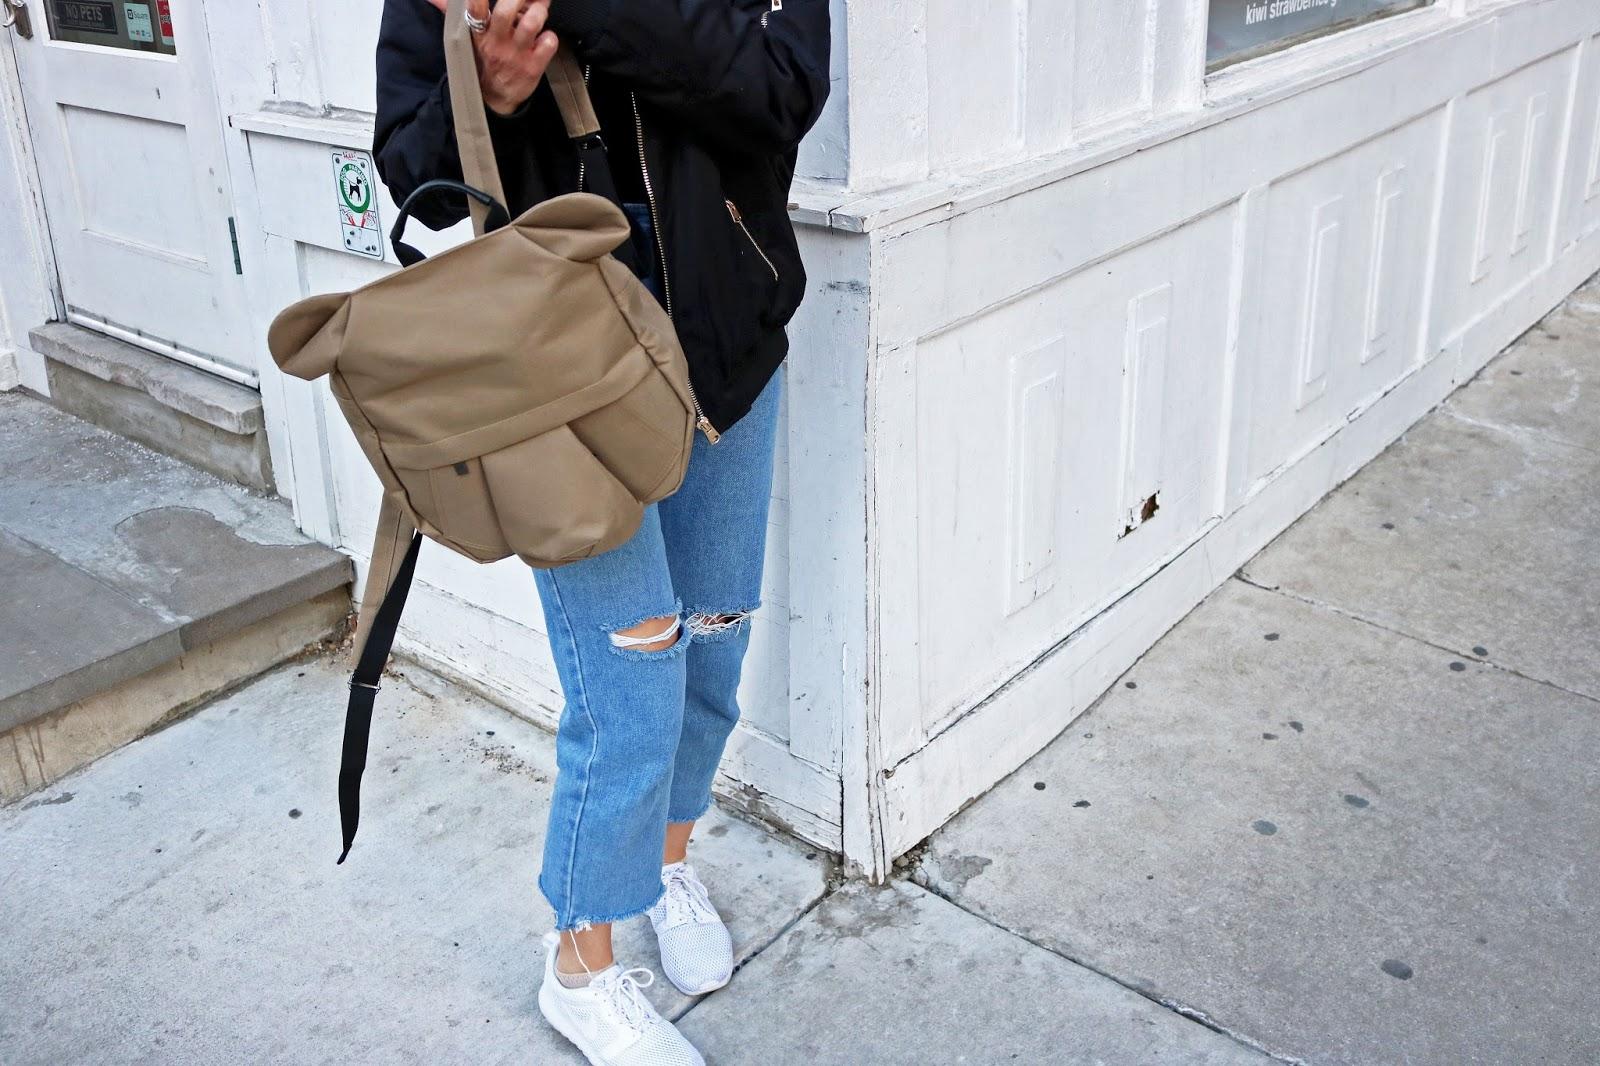 Origami Backpack, Denim Jeans, White Sneakers